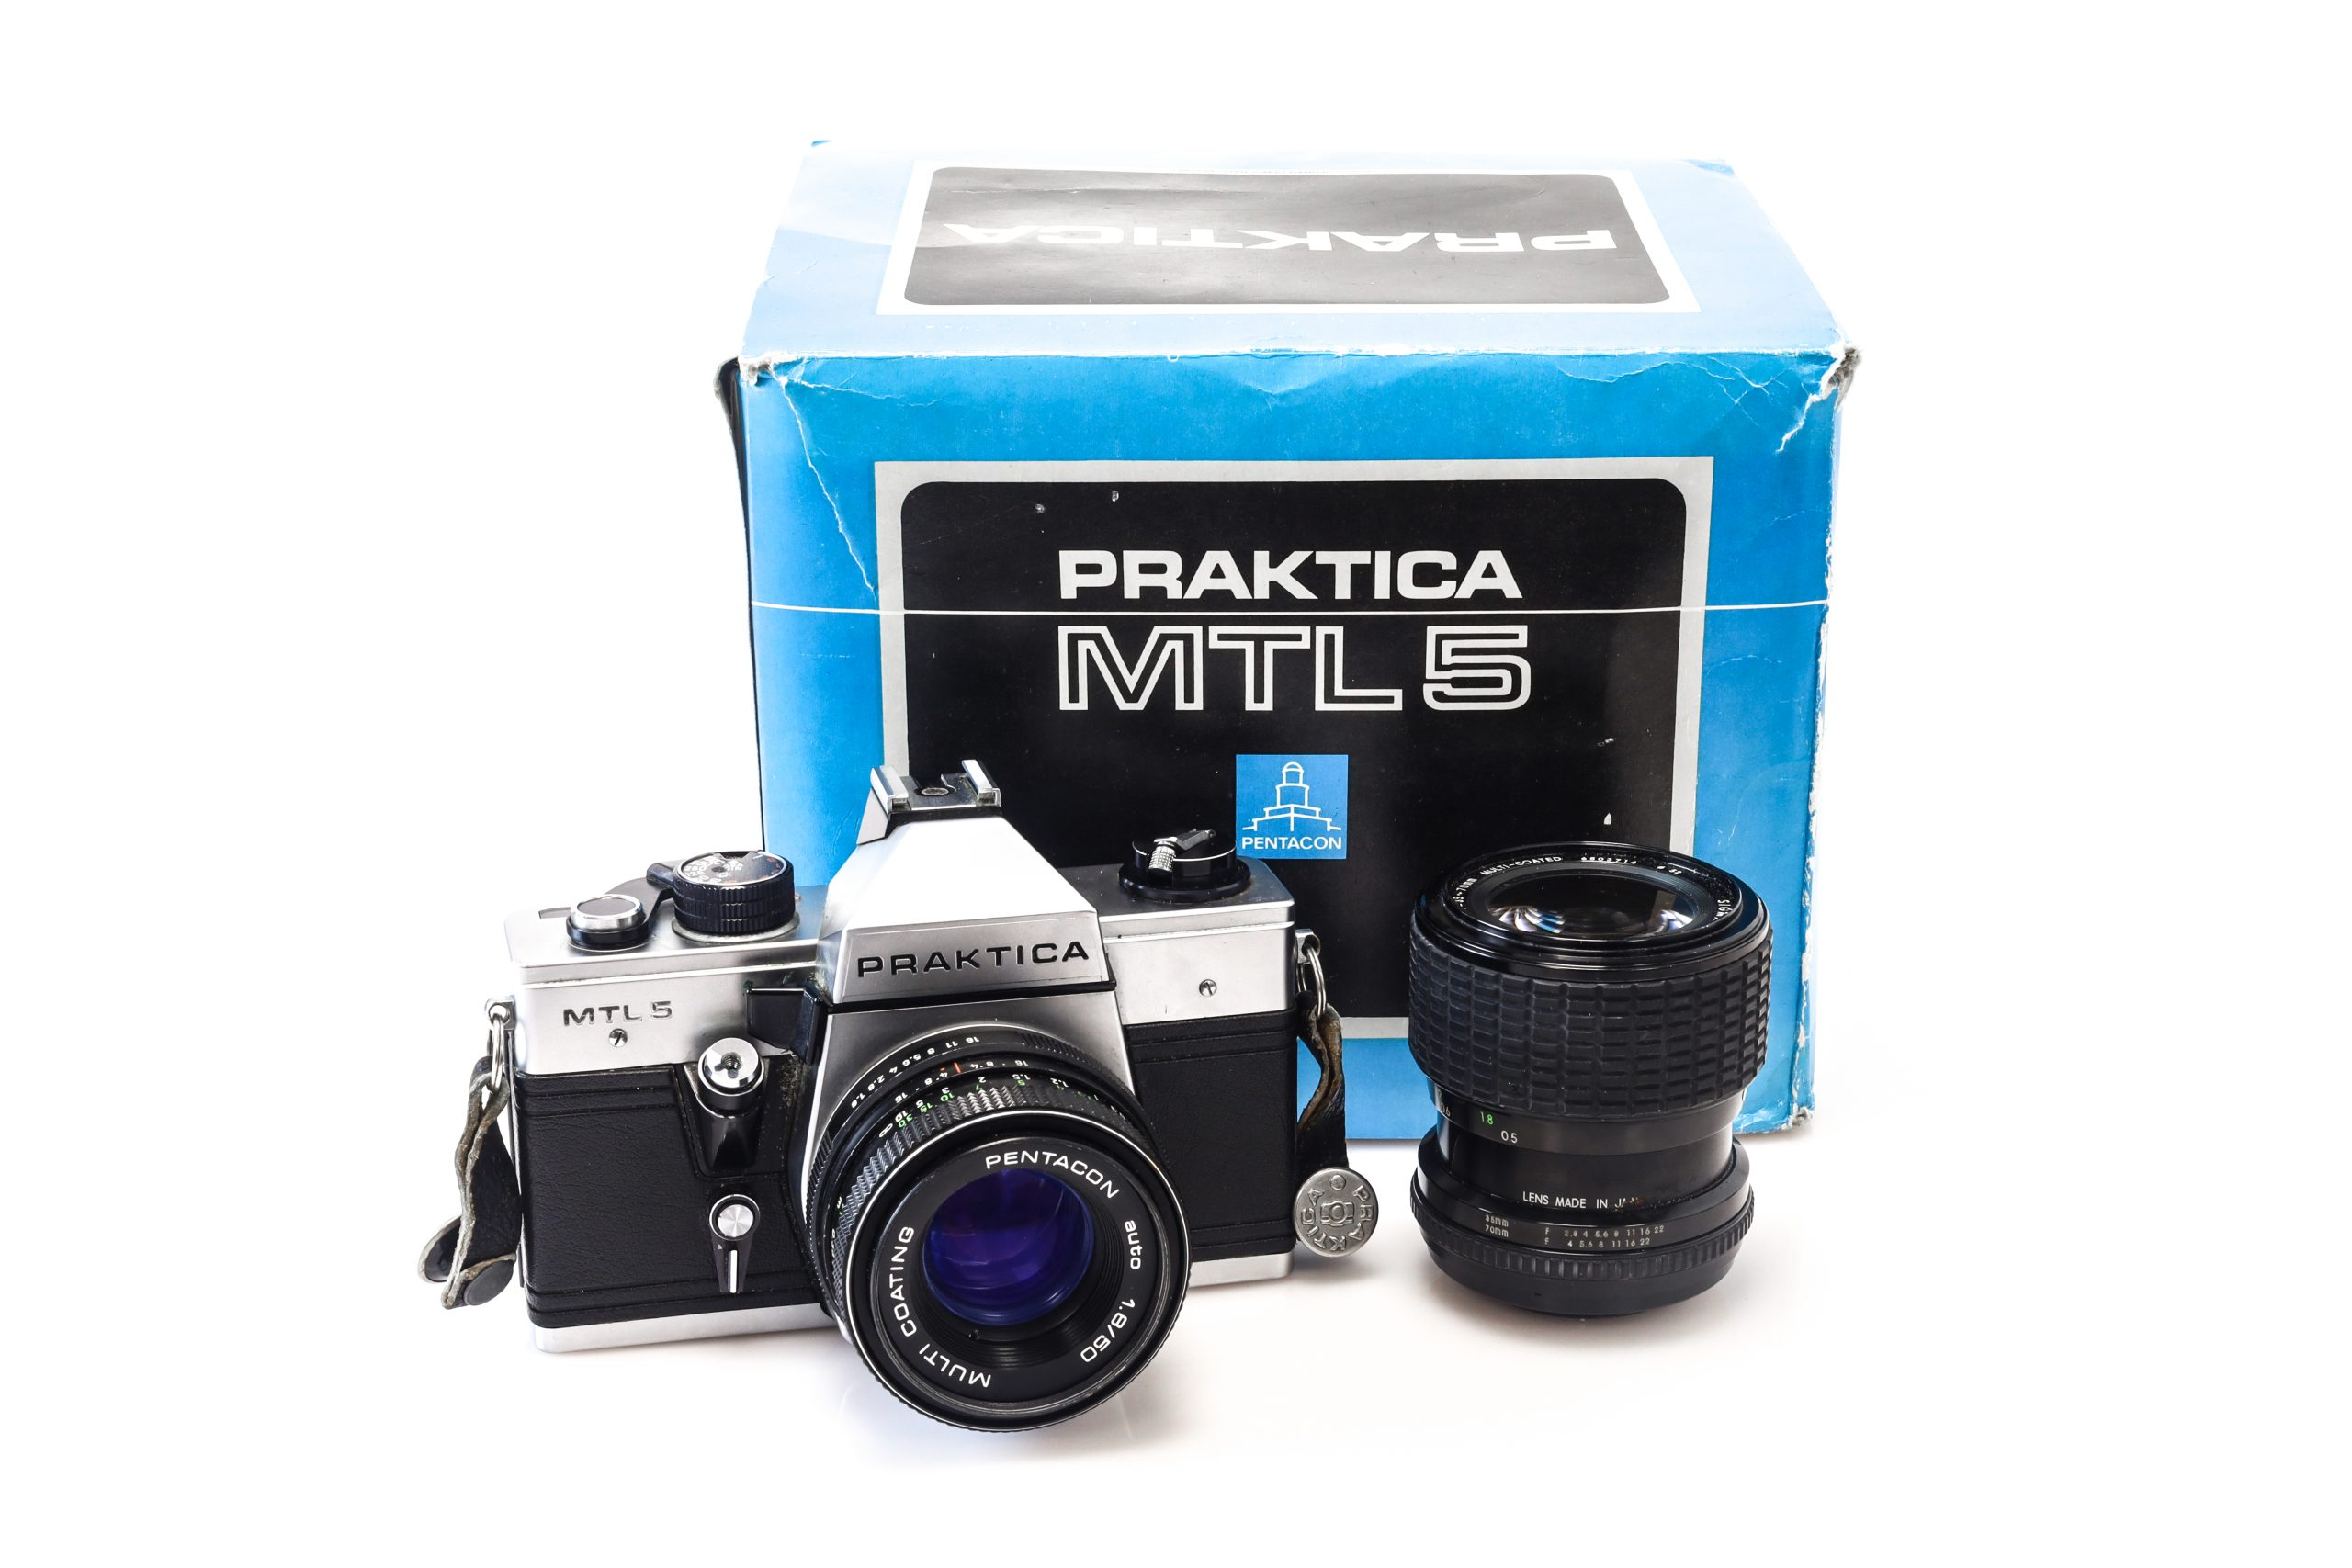 Praktica MTL 5 with 50mm Pentacon Lens + ORIGINAL BOX + Faulty Sigma 35-70mm Lens